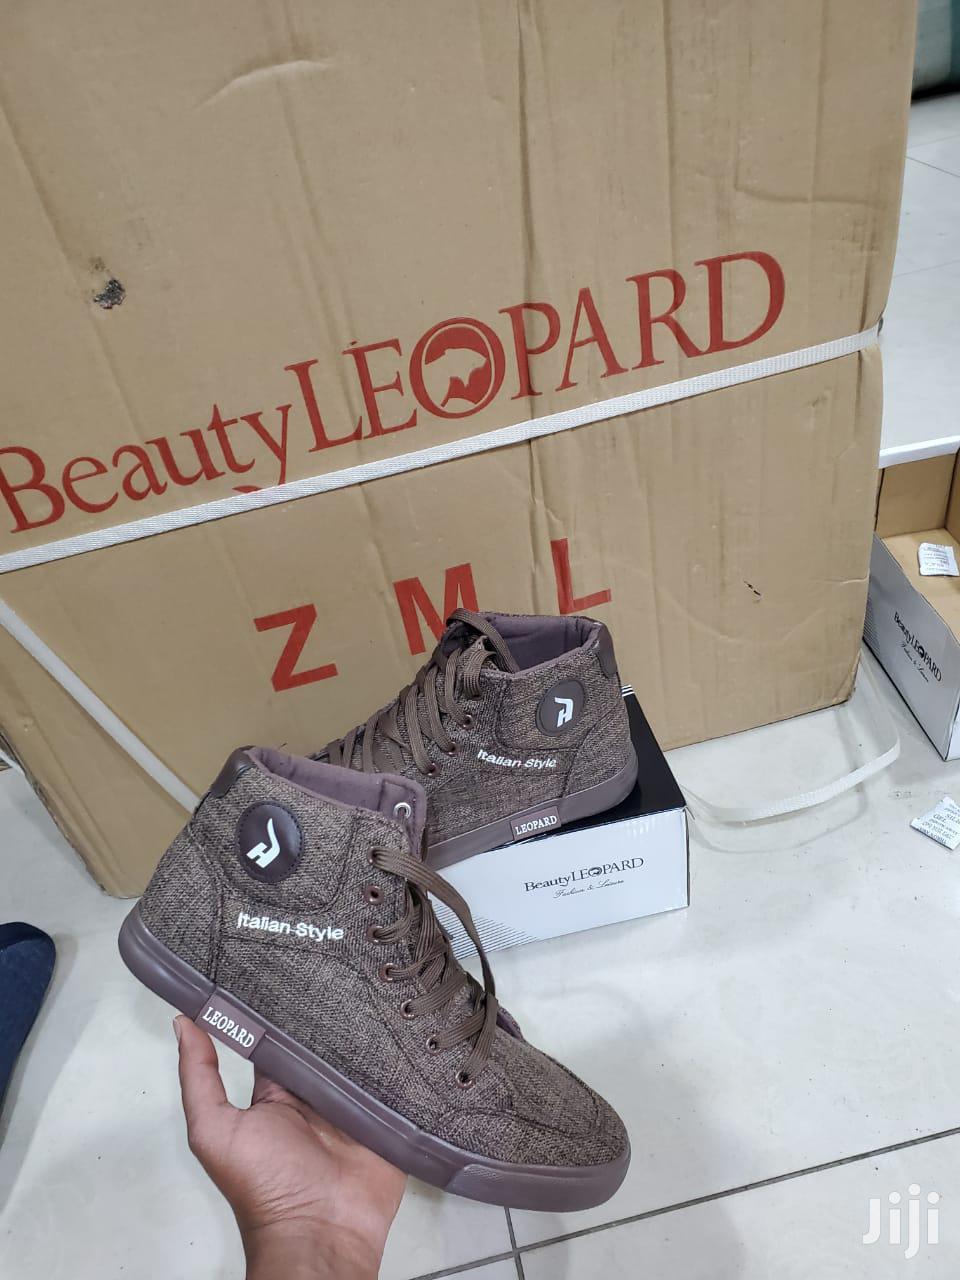 beauty leopard shoes